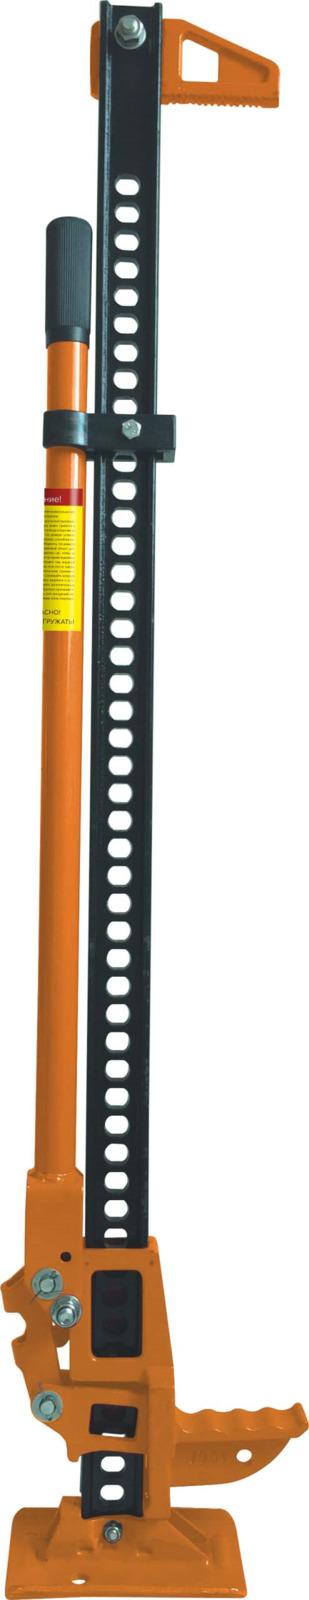 Фото - Реечный домкрат Кратон HJ-2,7-1200, оранжевый, высота подъема 102 см домкрат avs hj b10000 10т 236 476мм